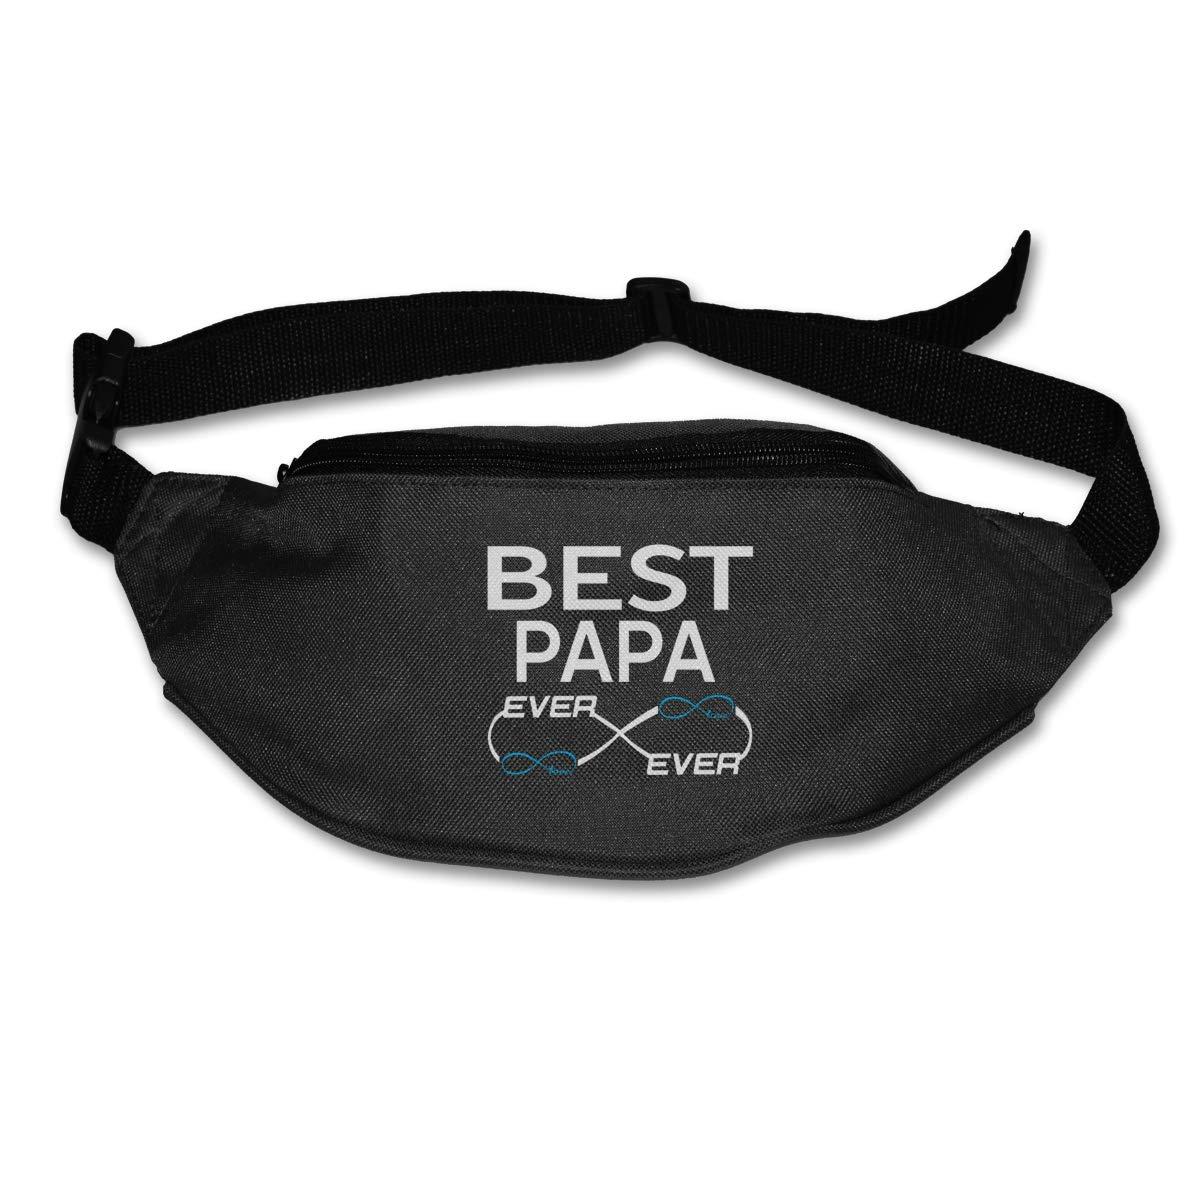 Best Papa Ever Sport Waist Packs Fanny Pack Adjustable For Hike